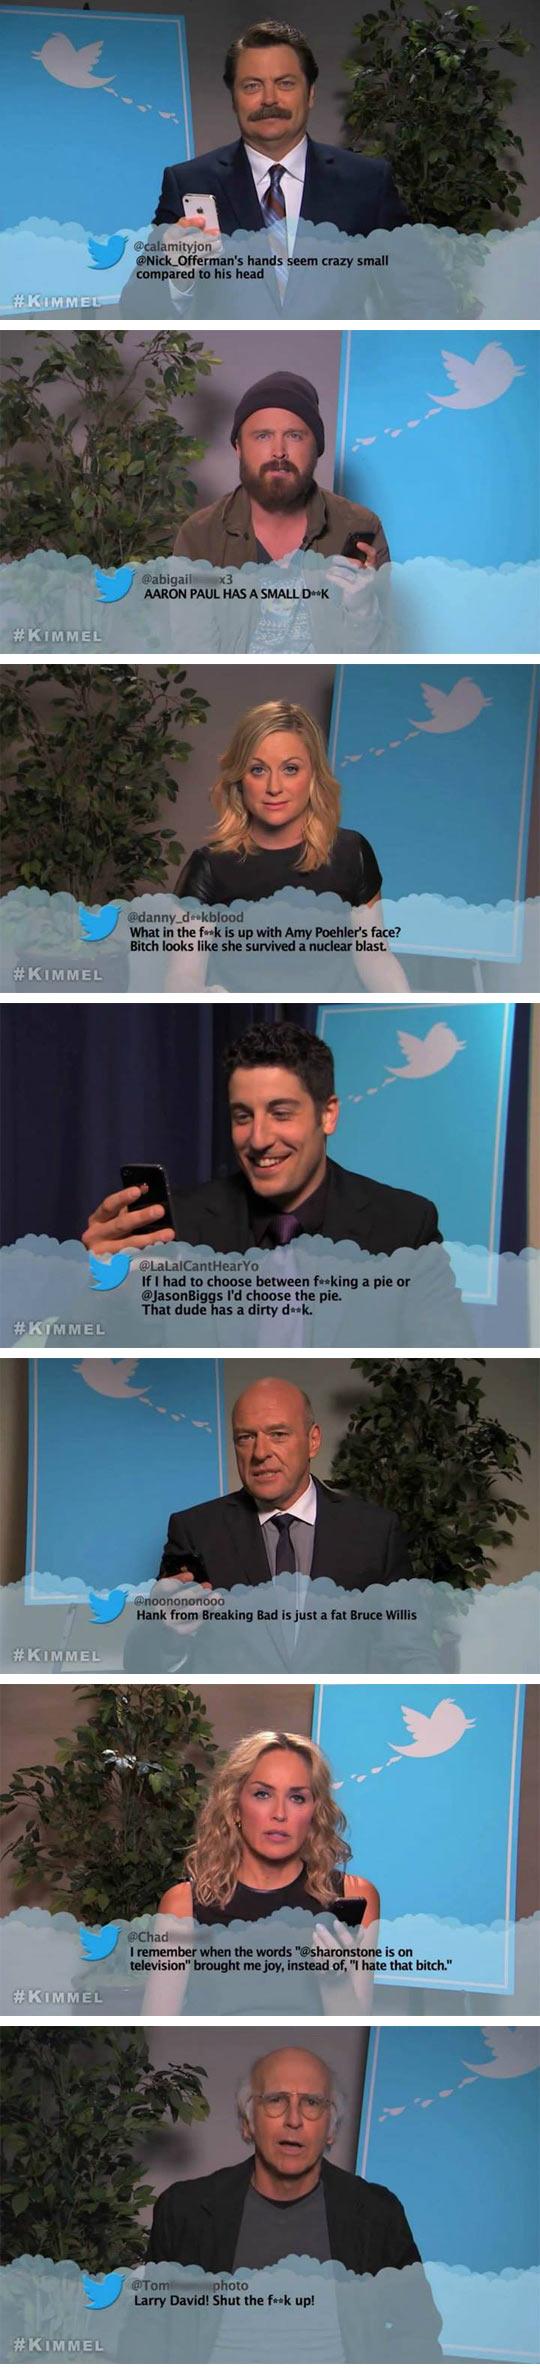 funny-celebrities-reading-Twitter-Nick-Offerman